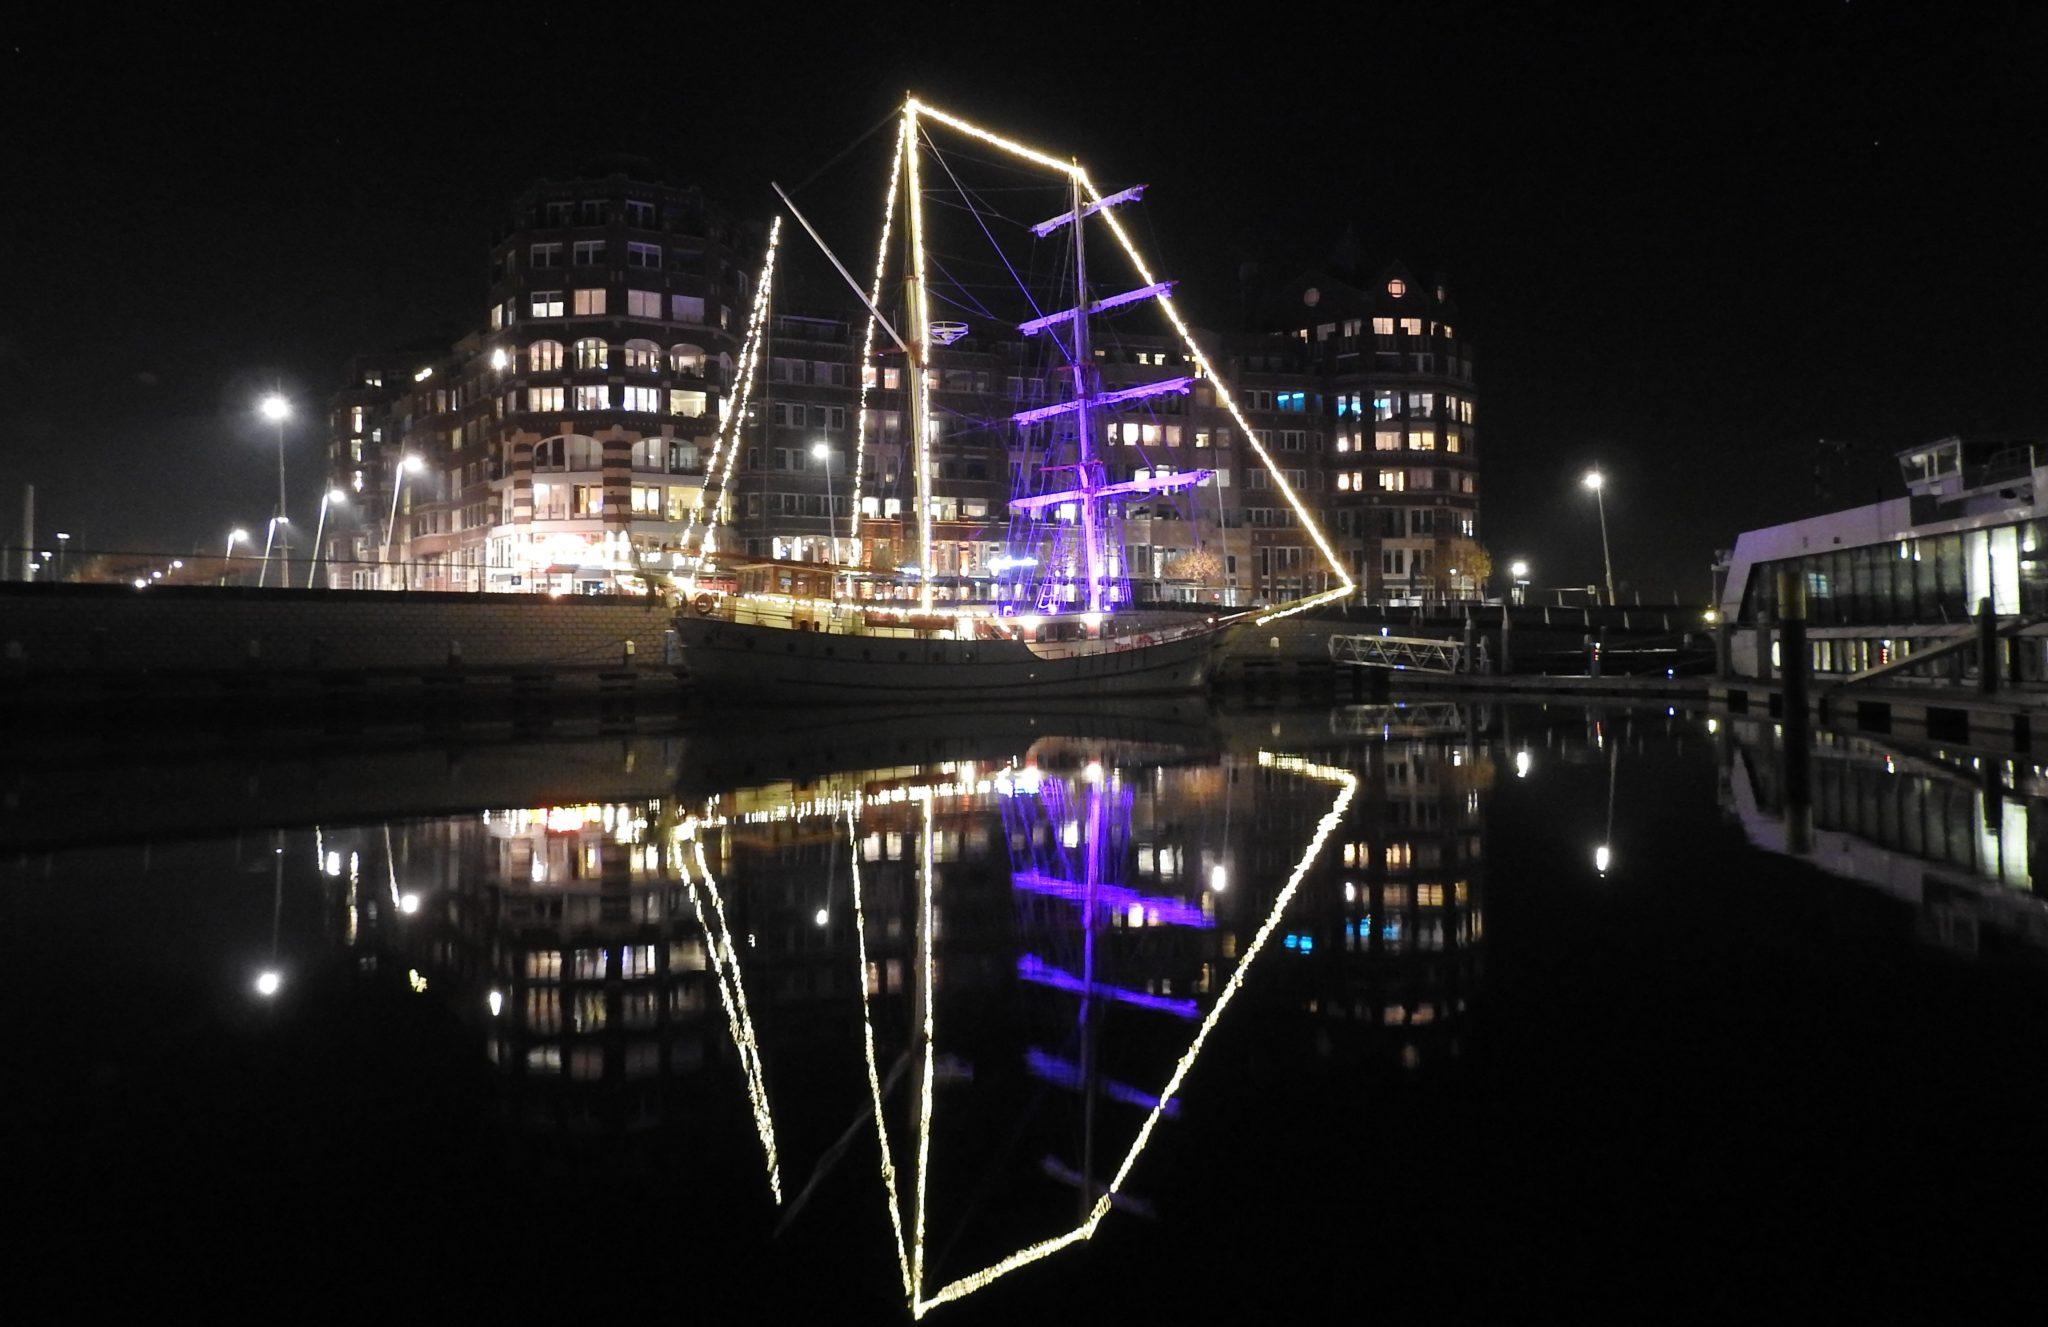 Bounty-Winteractiviteiten-Bataviahaven